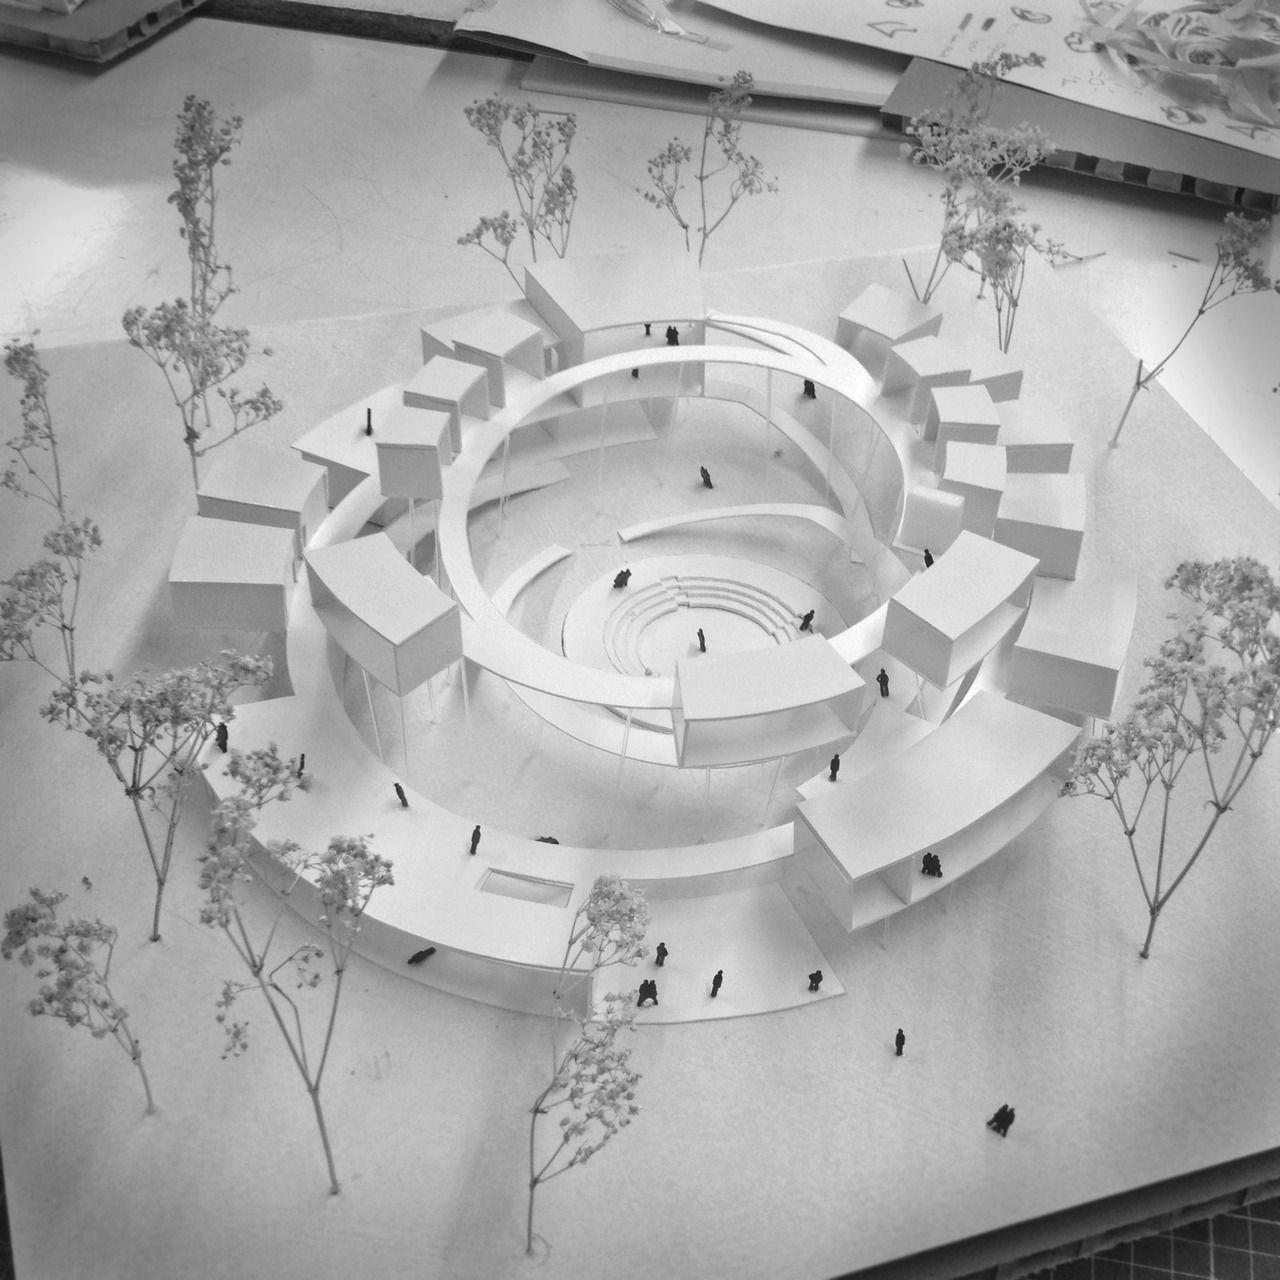 Concept model concept pinterest models architecture for Architectural concept models